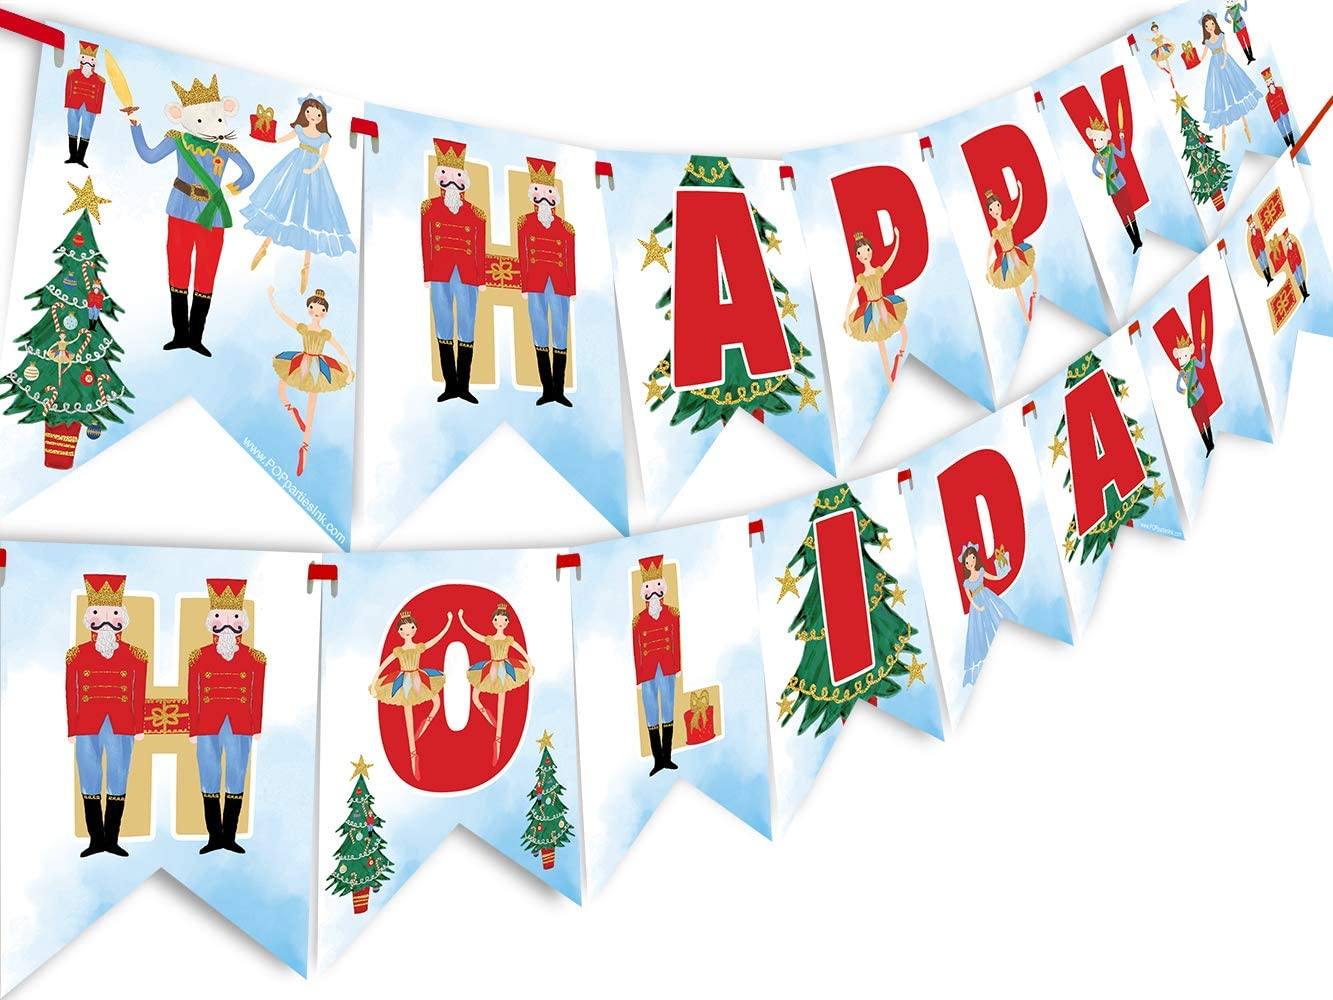 Nutcracker Happy Holidays Banner - Nutcracker Party Supplies - Nutcracker Party Decorations - Christmas Party Decoration - Holiday Party Supplies- HH Light